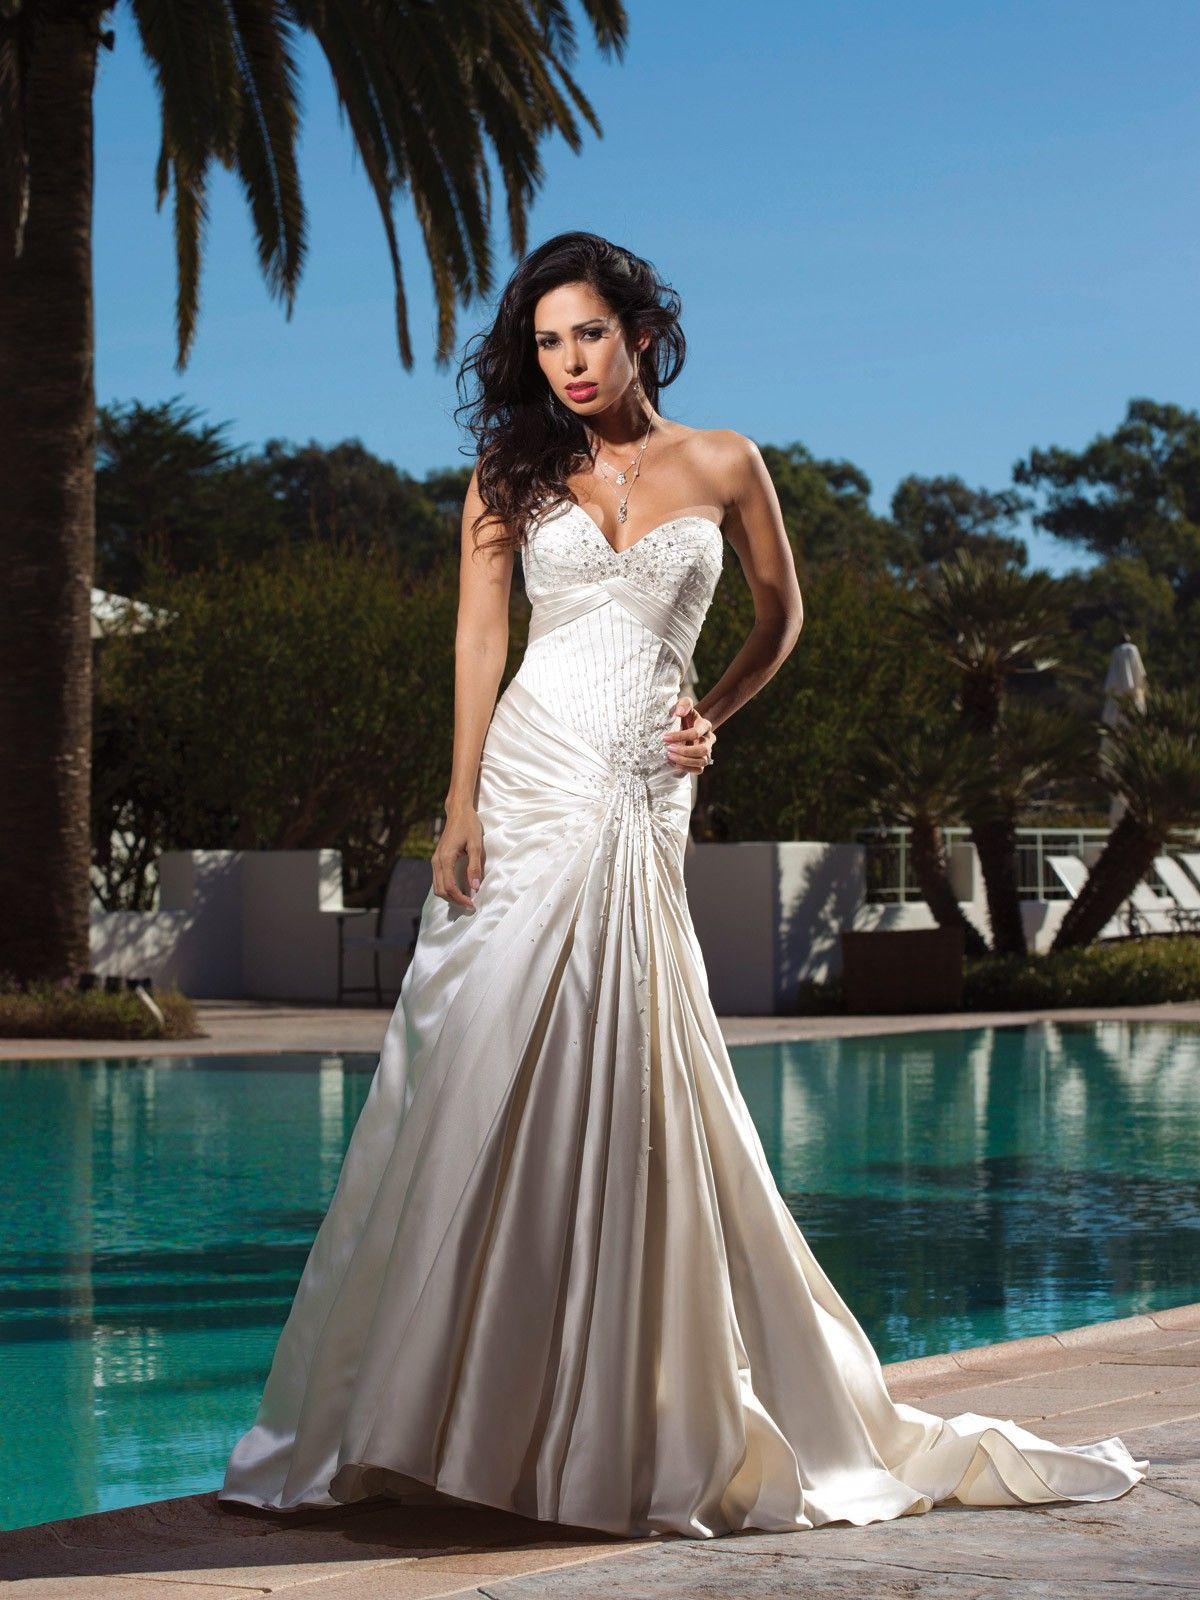 Dropped waist wedding dress  Sweetheart dropped waist satin wedding dress   Wedding